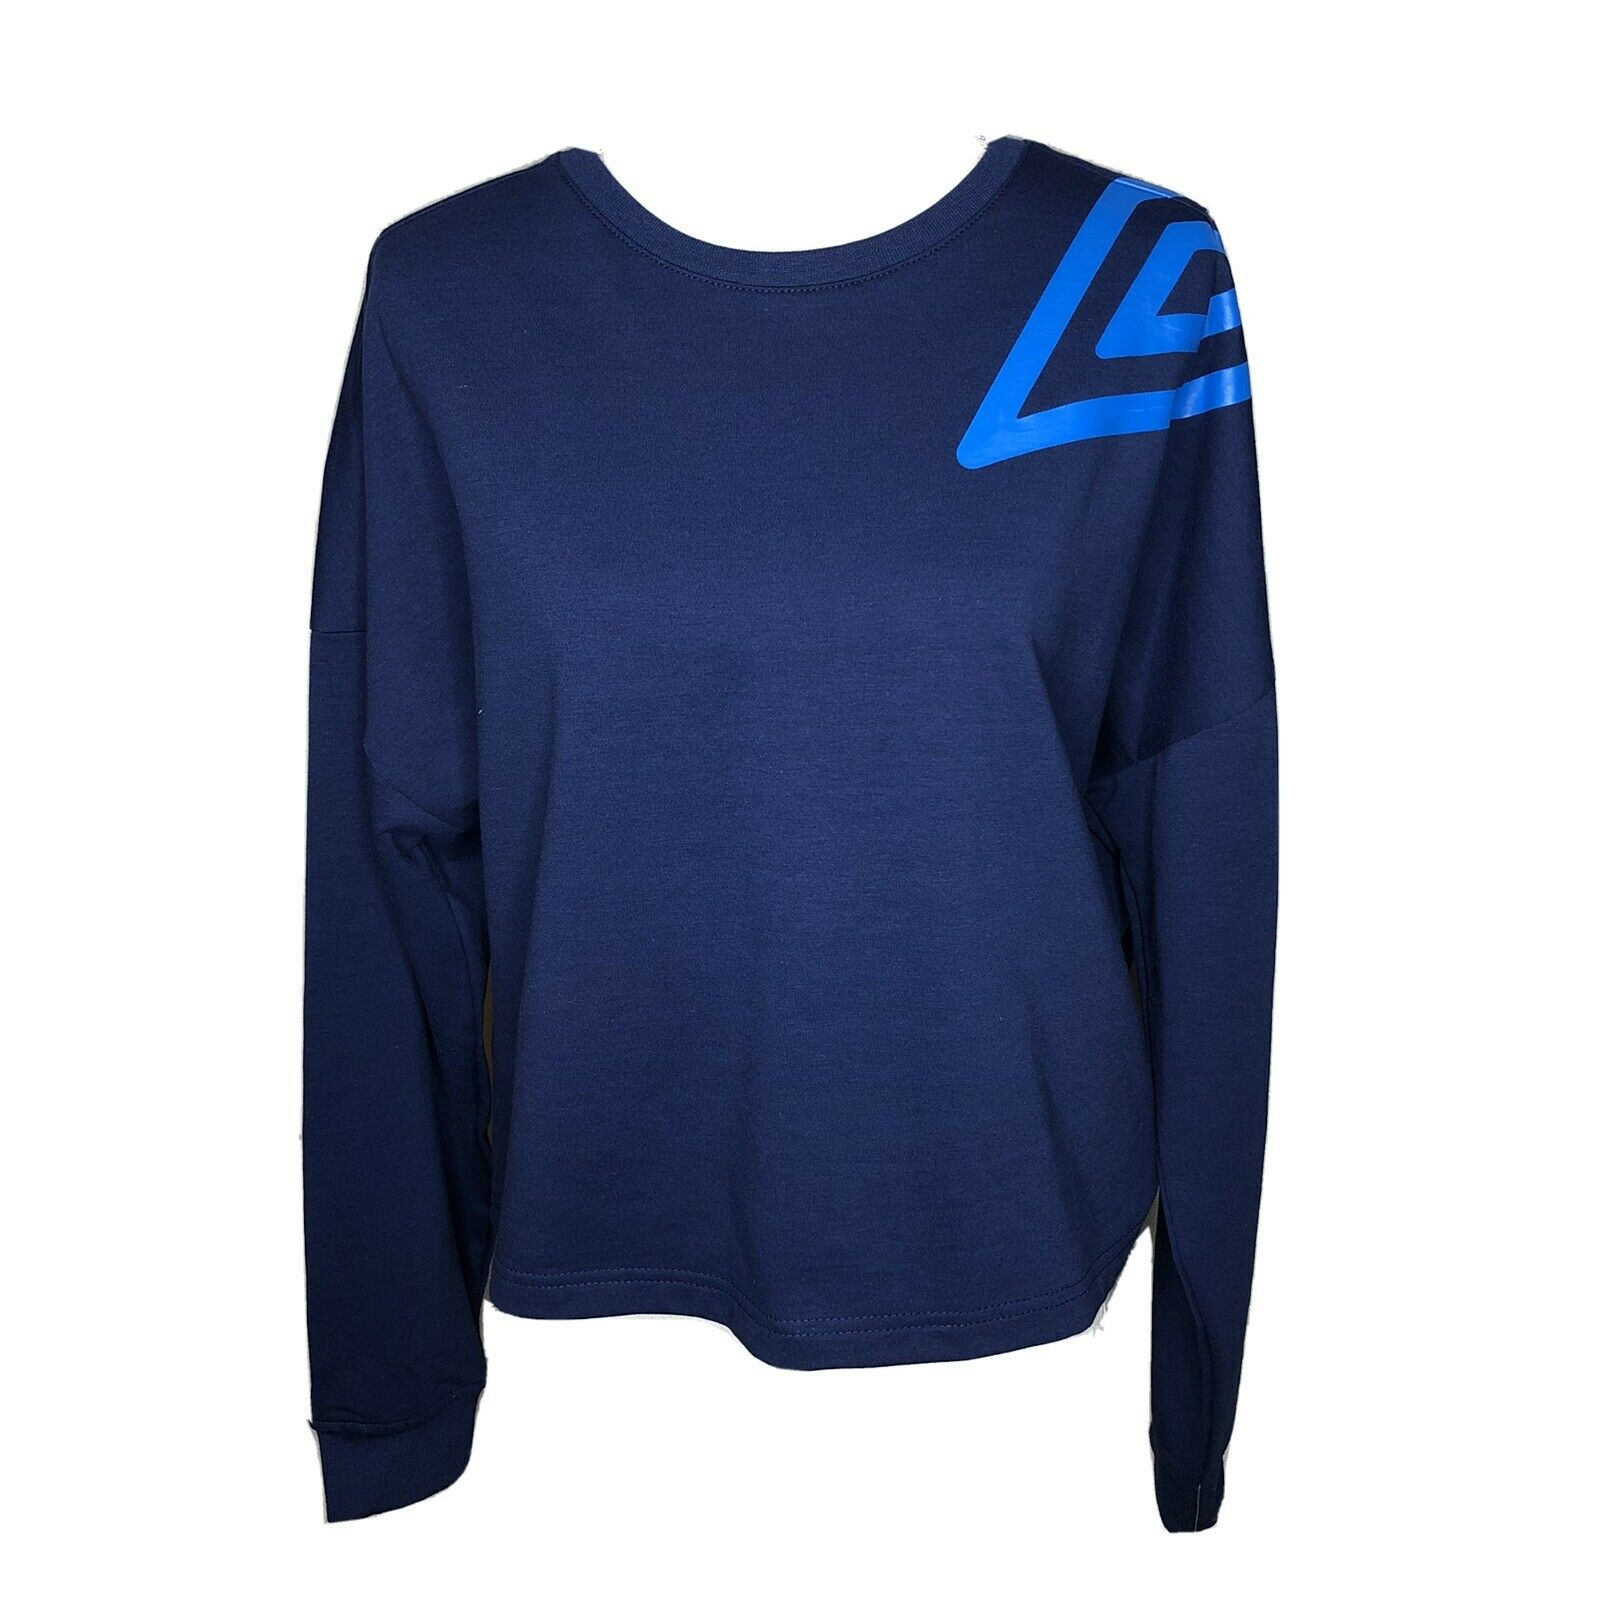 NWT Umbro Womens Sweatshirt Blue Crew Neck Soccer Athleisure Gift Casual Sz XL